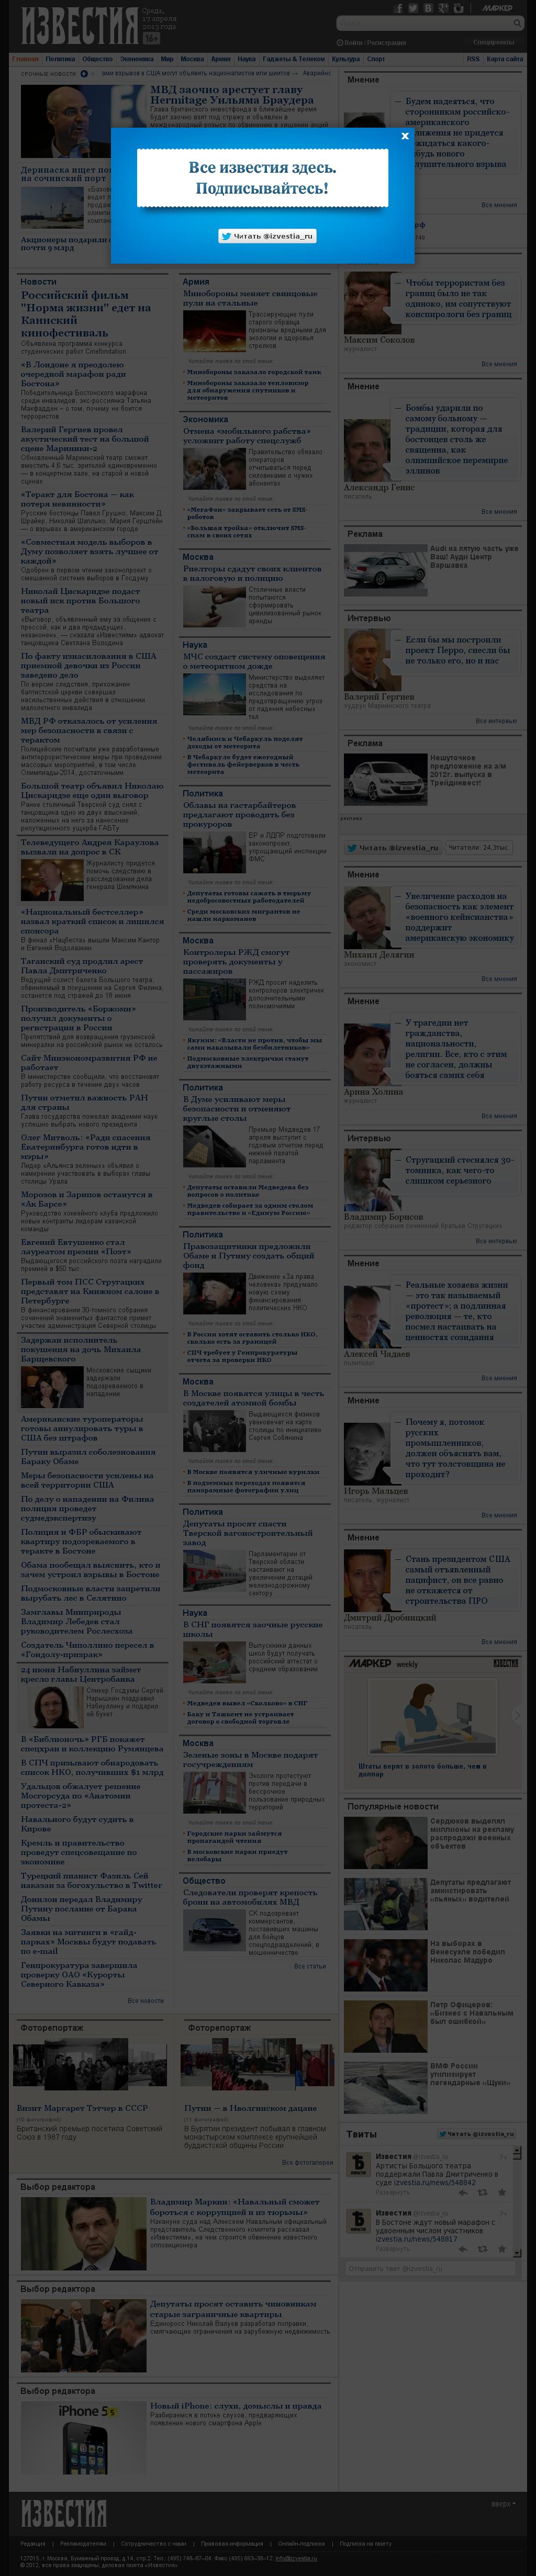 Izvestia at Wednesday April 17, 2013, 12:10 a.m. UTC